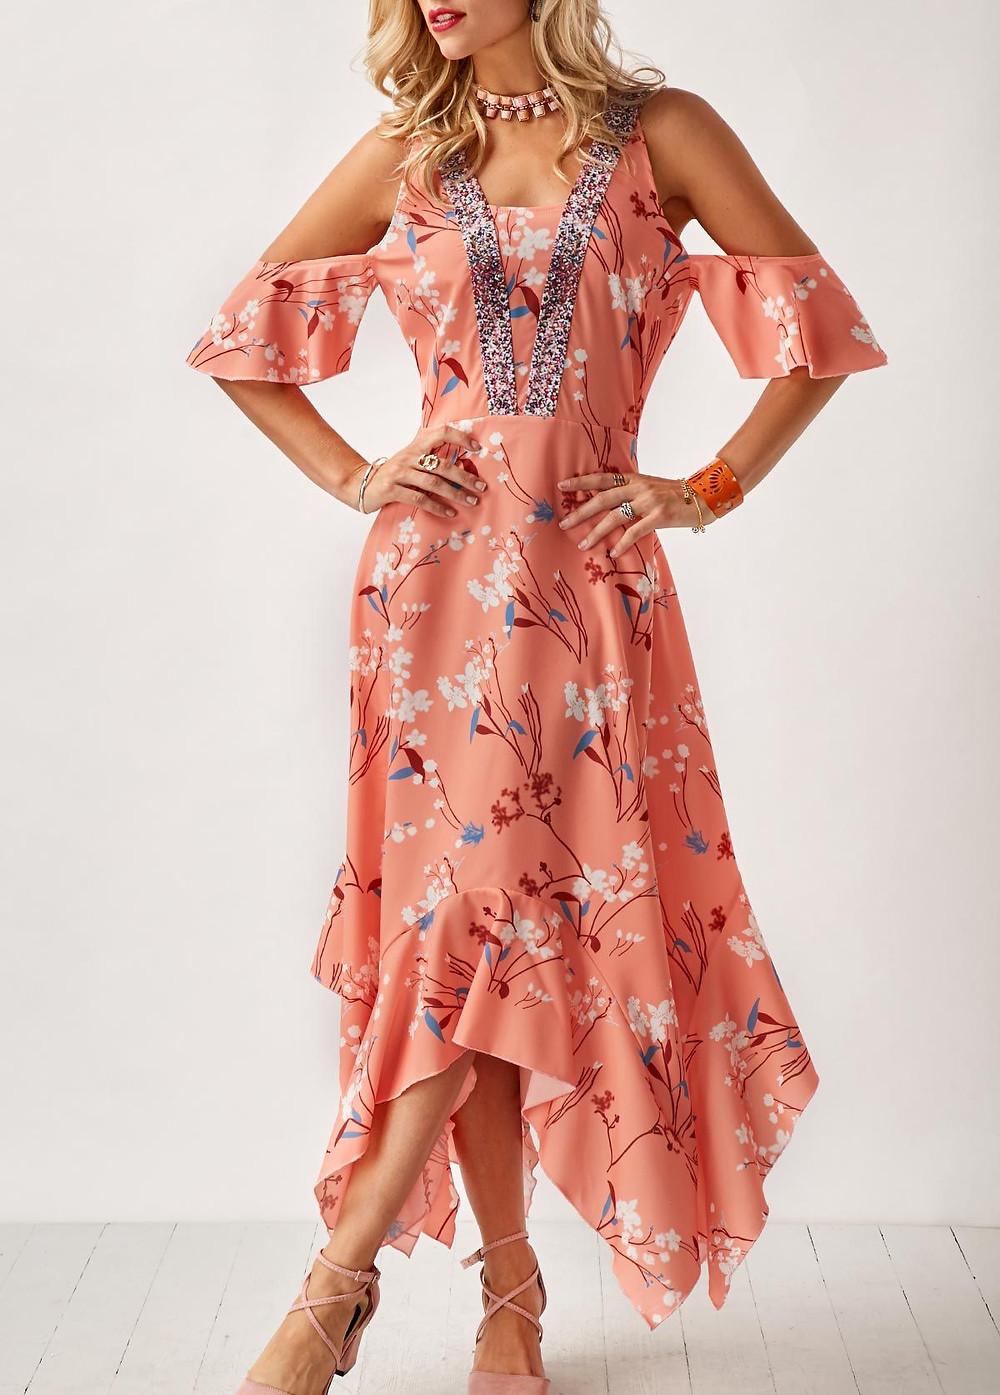 Woman Wearing Printed Asymmetric Hem Cold Shoulder Pastel Orange Dress From Roswe